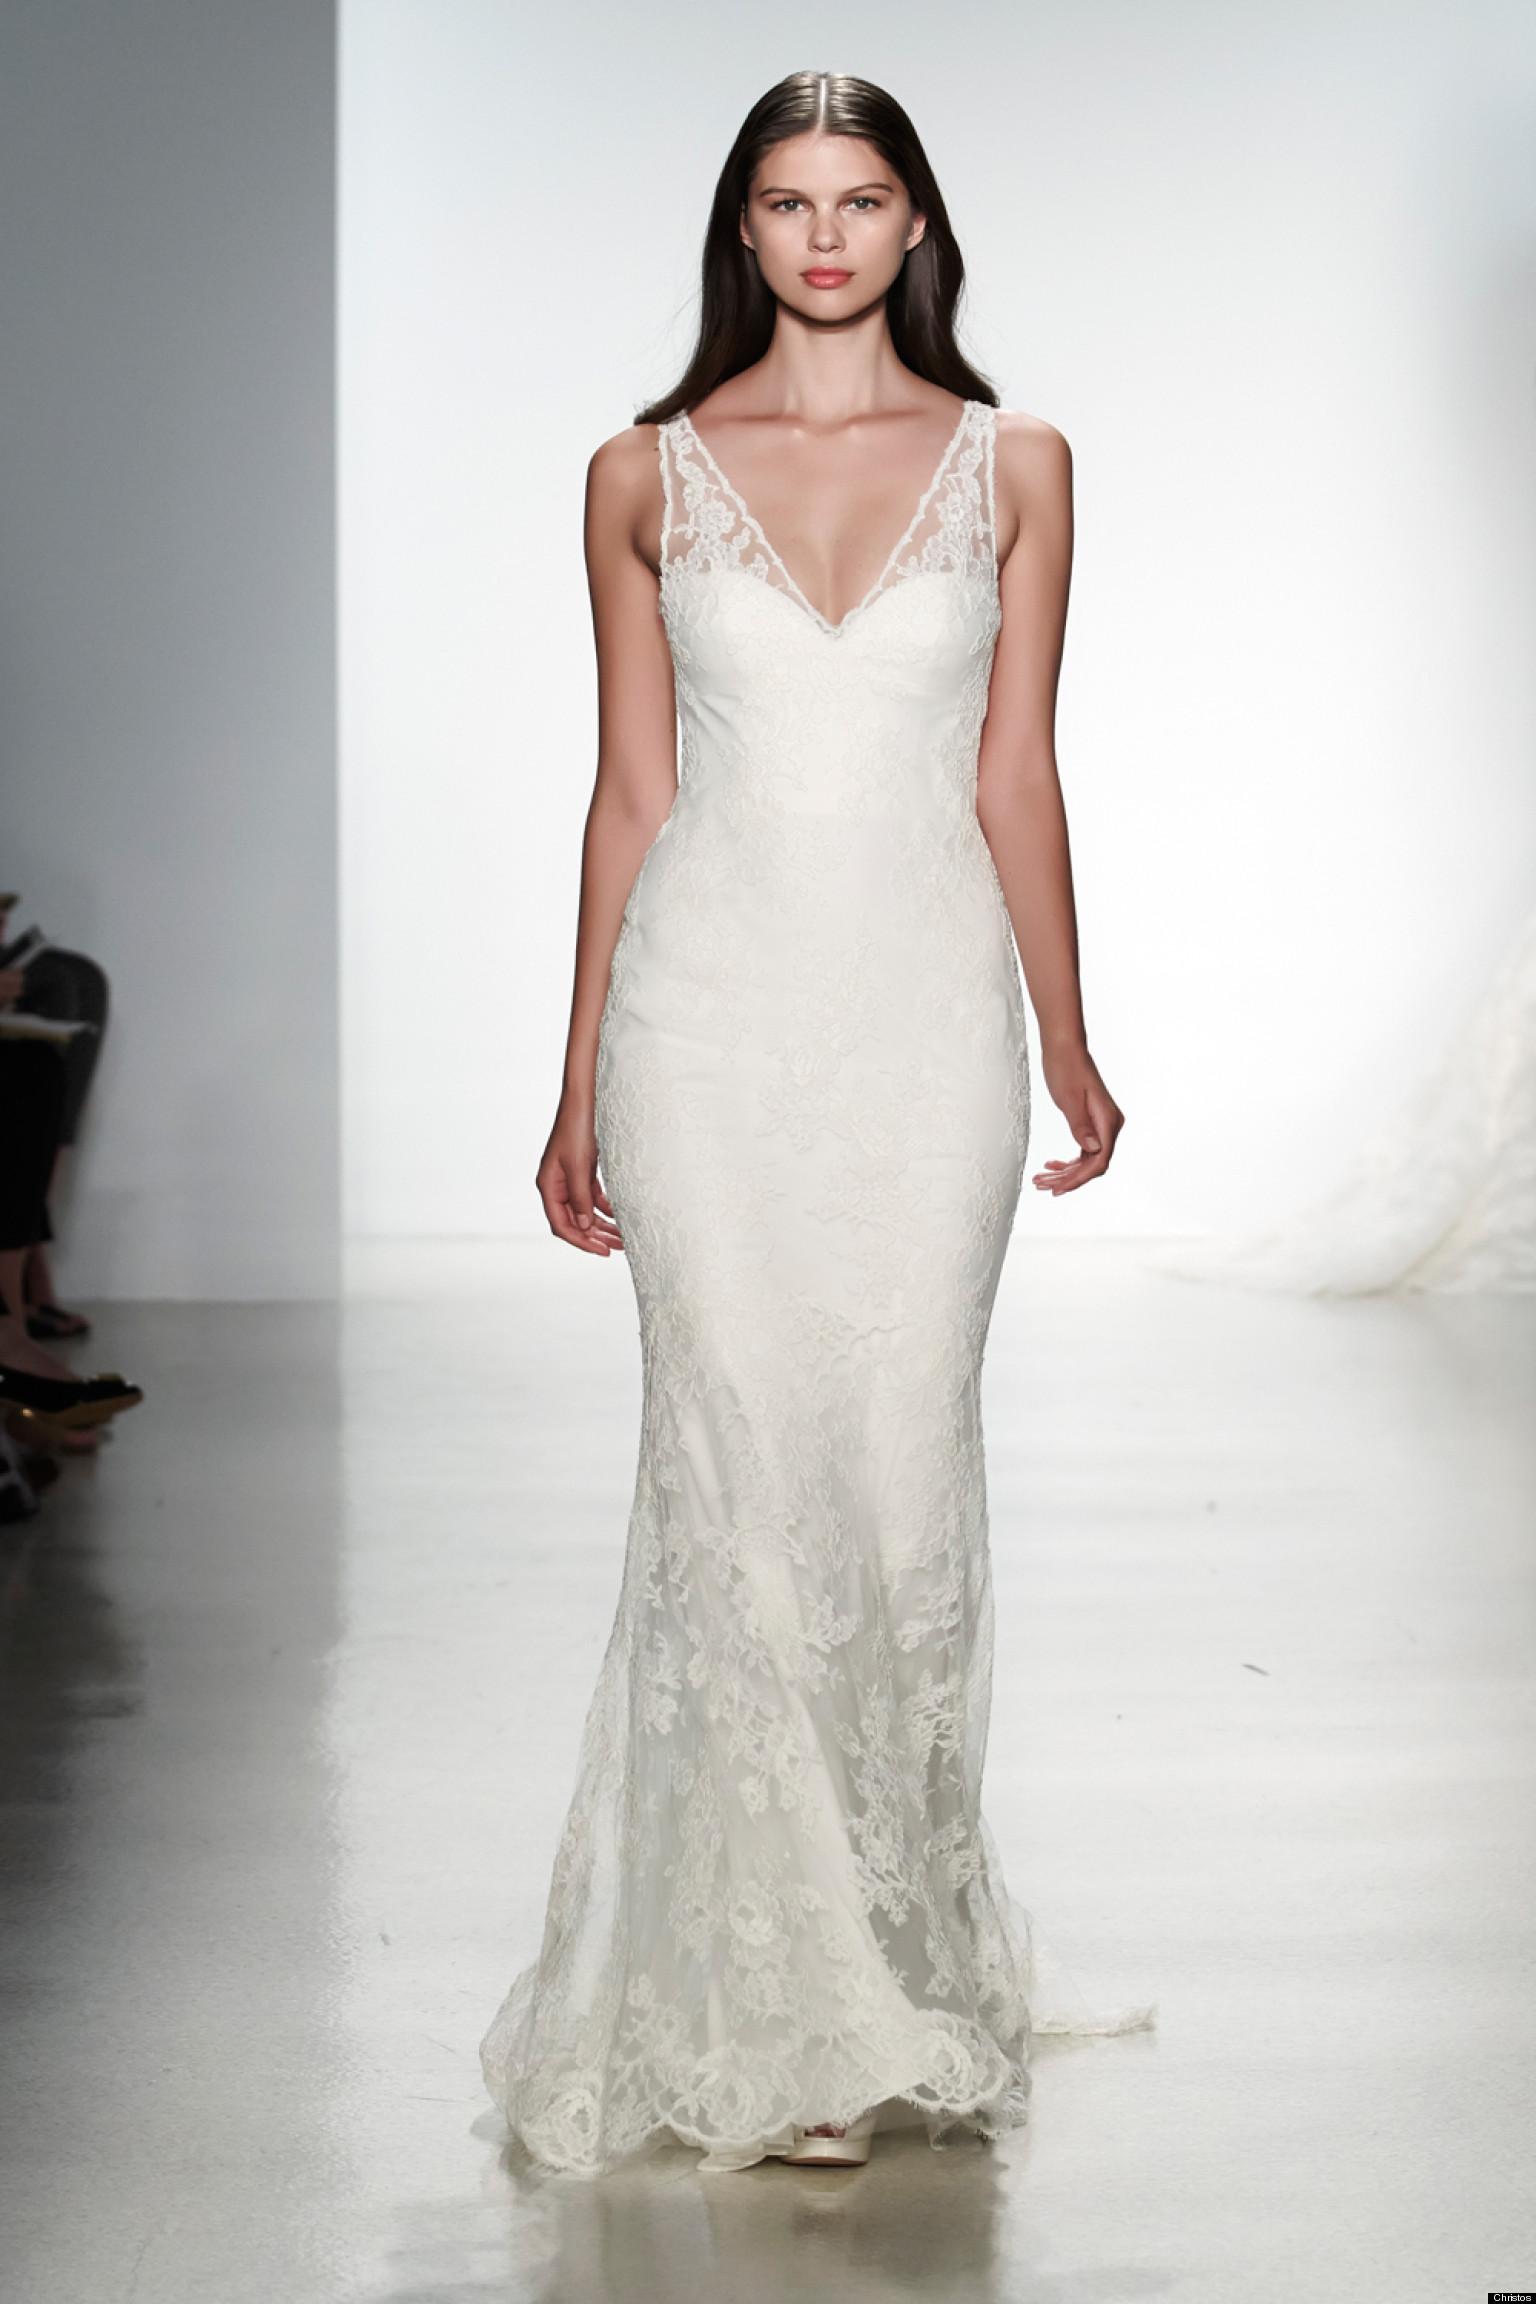 choosing the best wedding b wedding dresses for petite